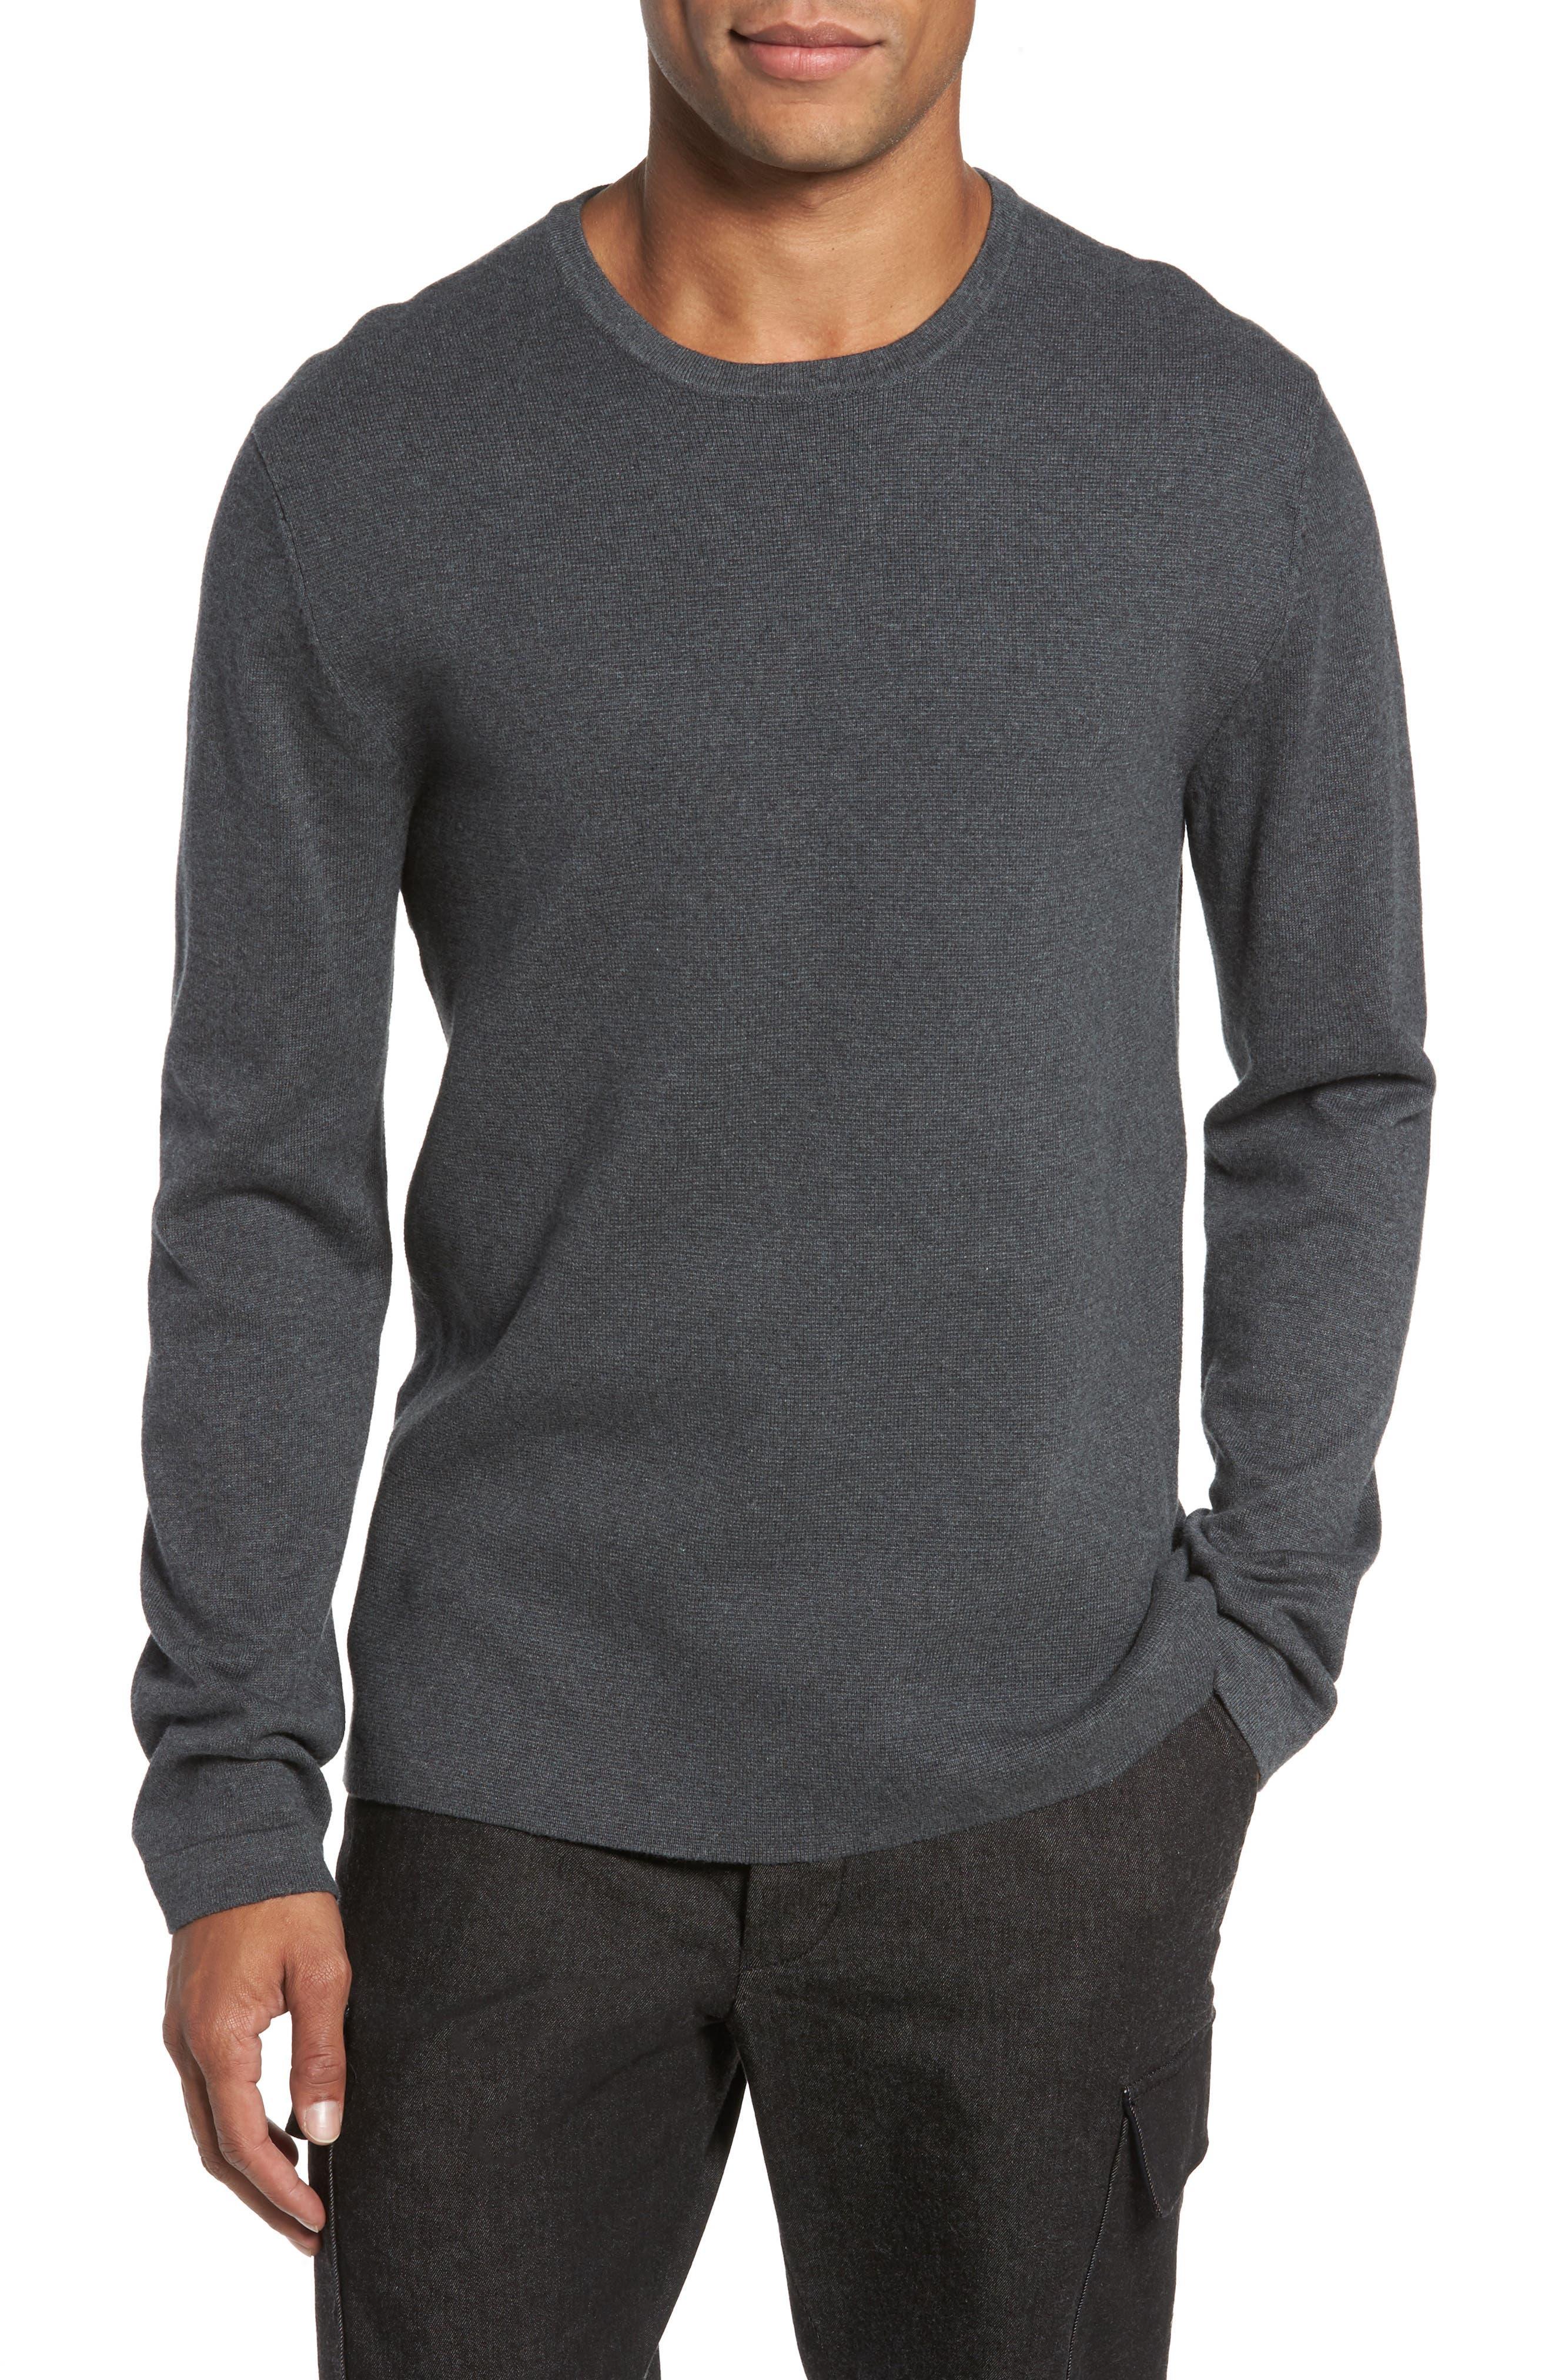 Milano Front Regular Fit Cotton Sweater,                             Main thumbnail 1, color,                             CHARCOAL MELANGE